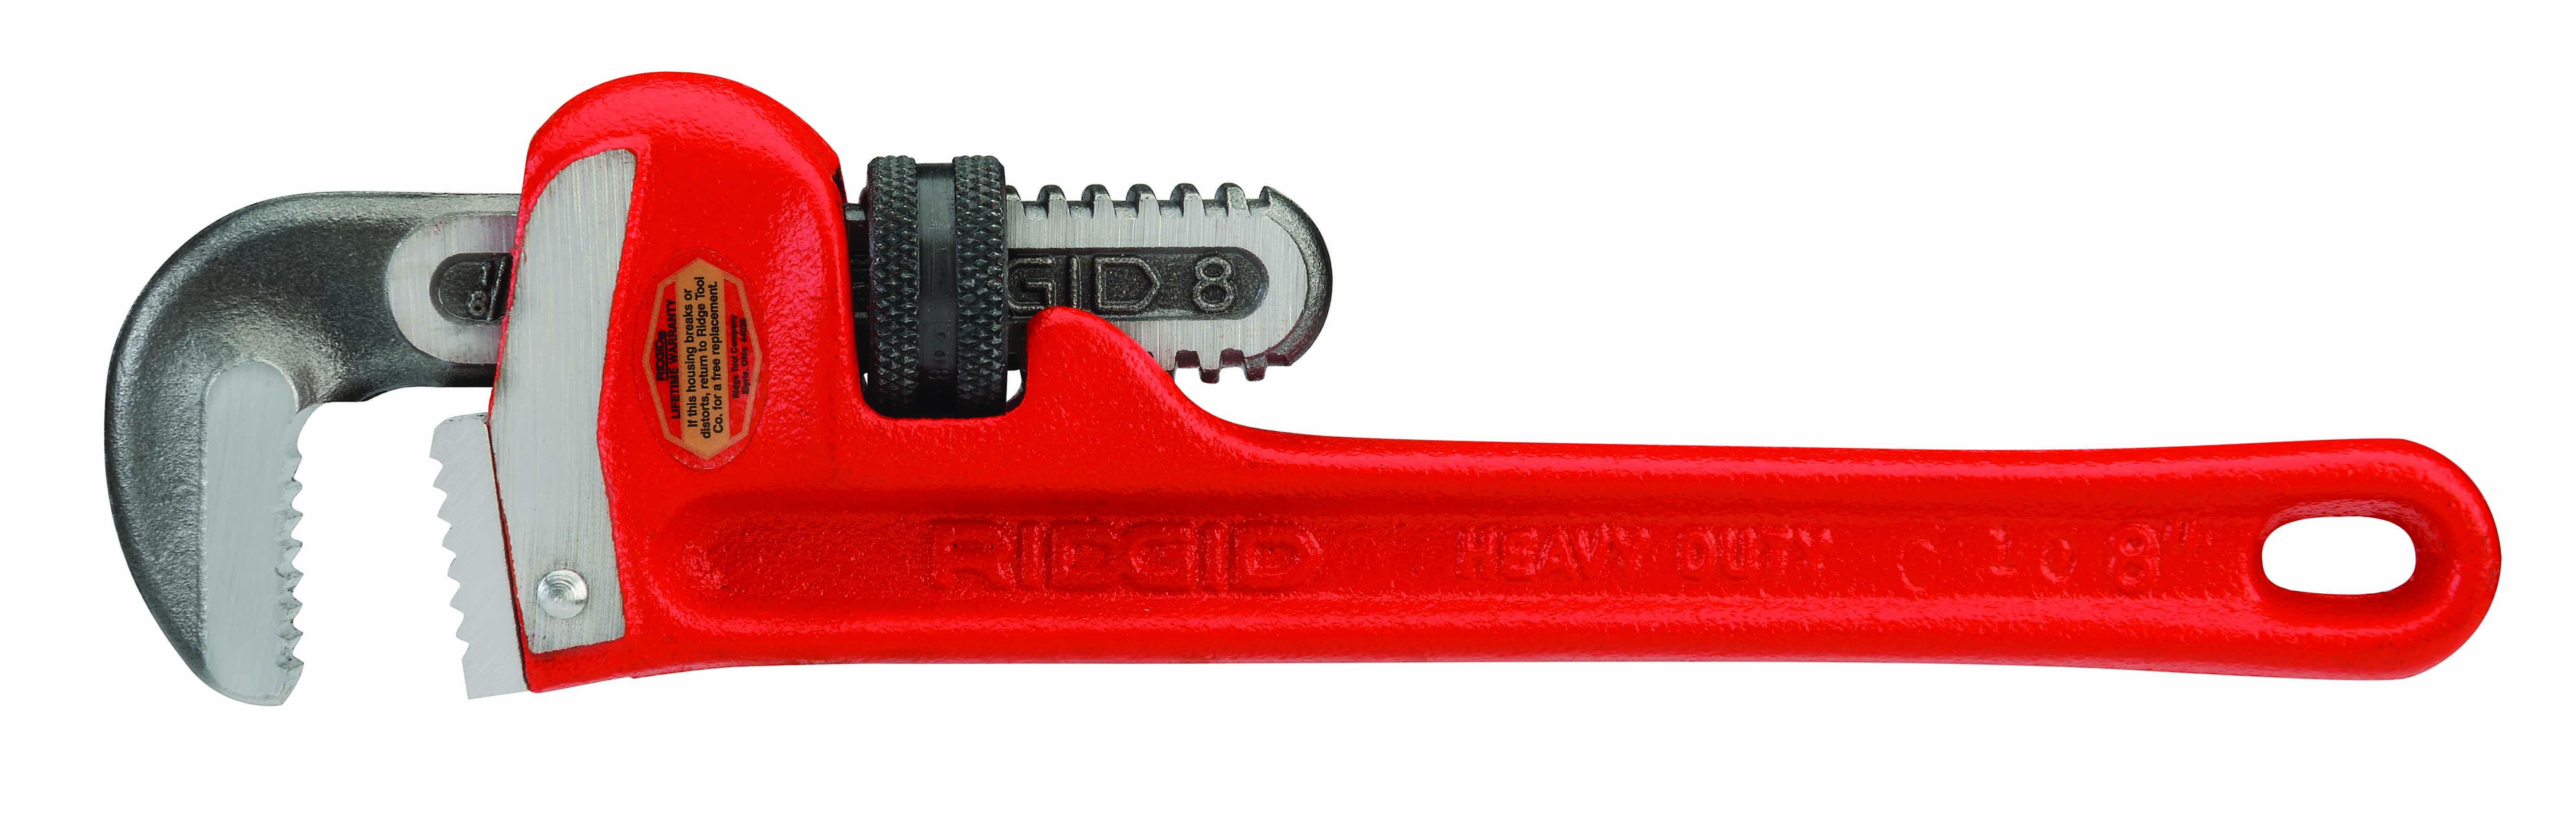 RIDGID 31005 - Heavy Duty Pipe Wrench  8-inch